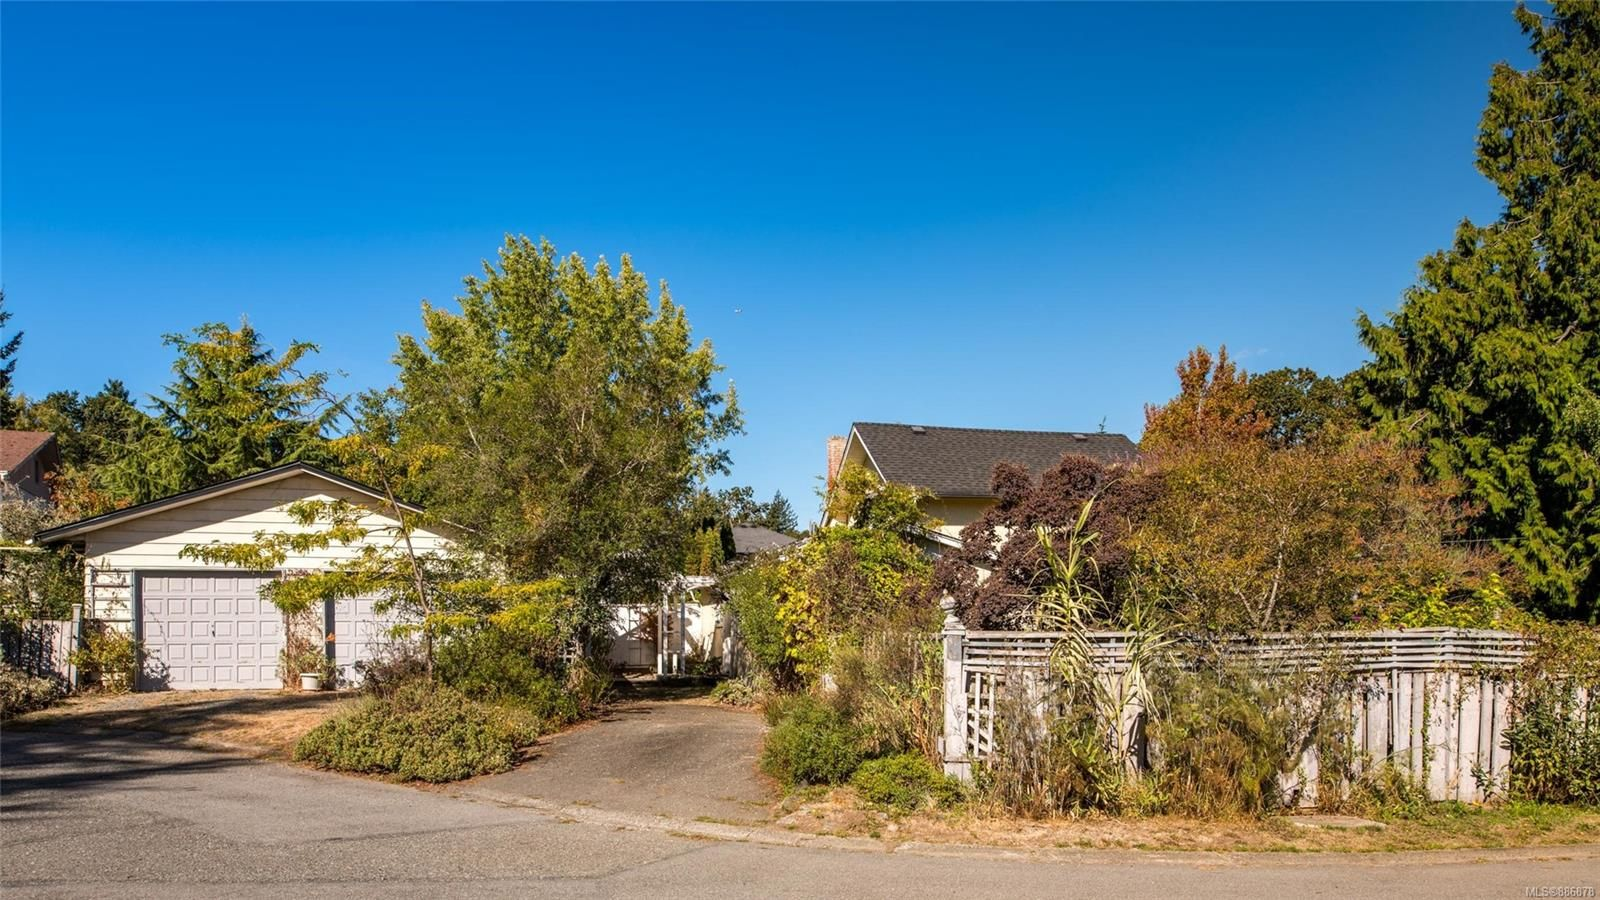 Main Photo: 951 Jasmine Ave in Saanich: SW Marigold House for sale (Saanich West)  : MLS®# 886878